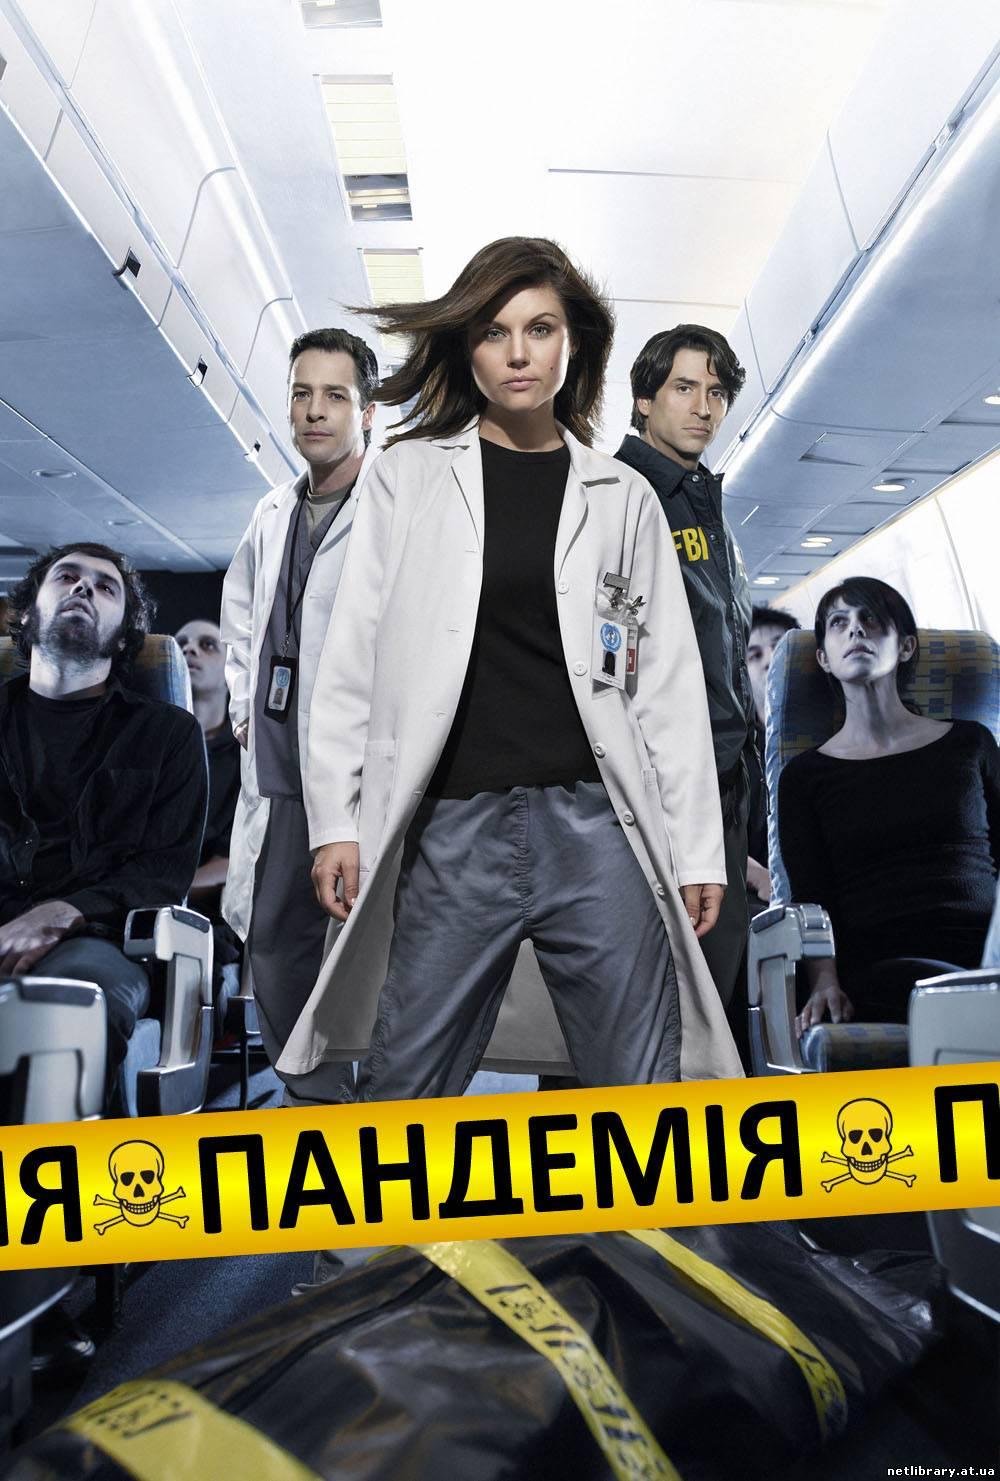 Пандемія (1 Сезон) / Pandemic (Season 1) (2007) укр дубляж онлайн